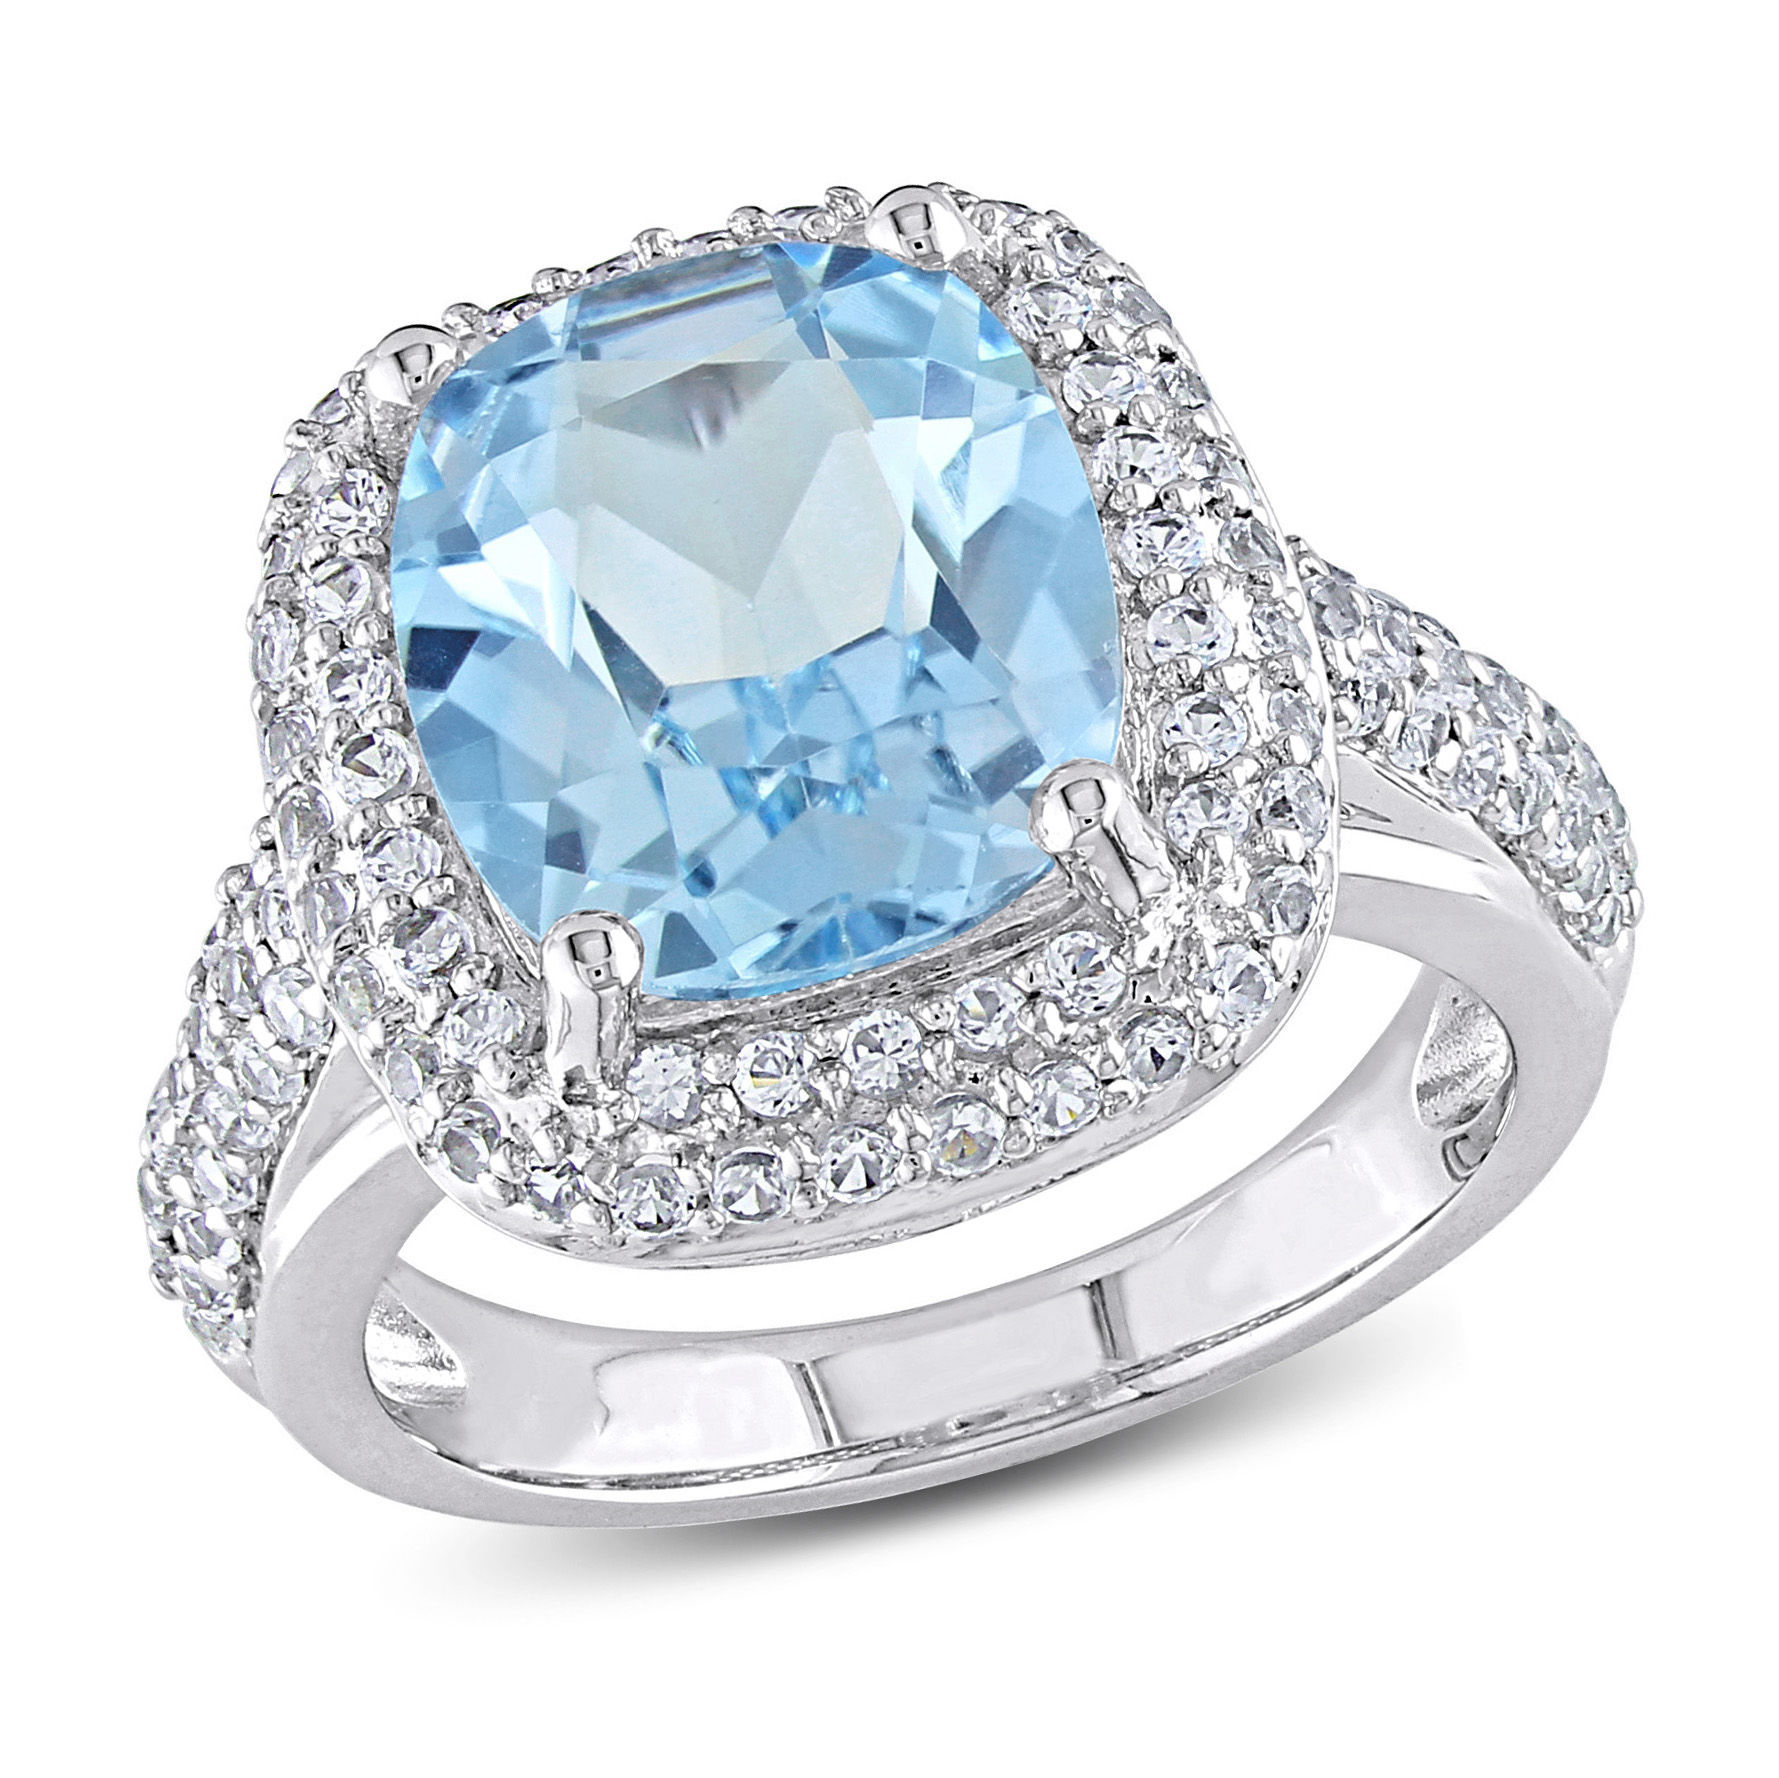 7 1/4 CT TGW Sky Blue Topaz Created White Sapphire Ring Silver